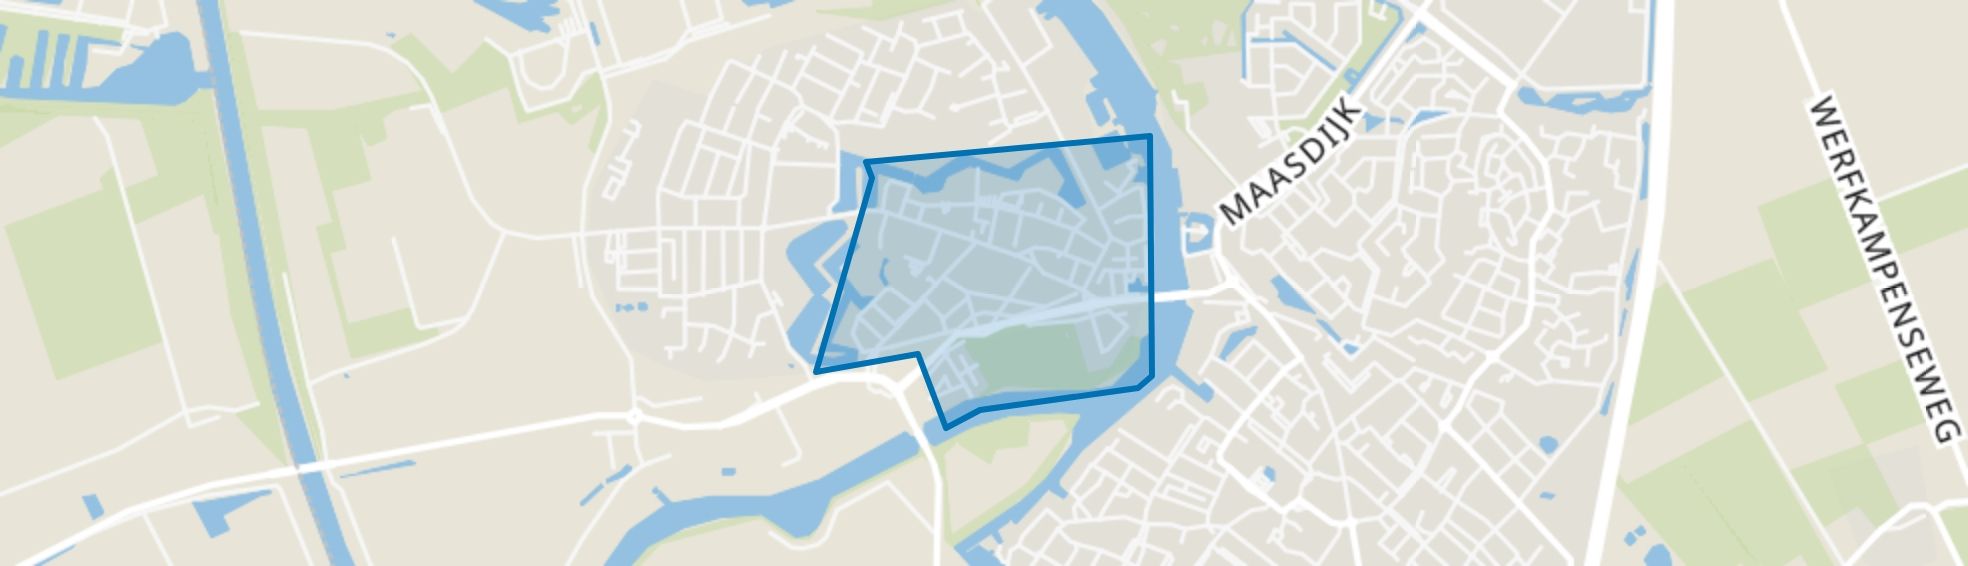 Geertruidenberg-Kom, Geertruidenberg map